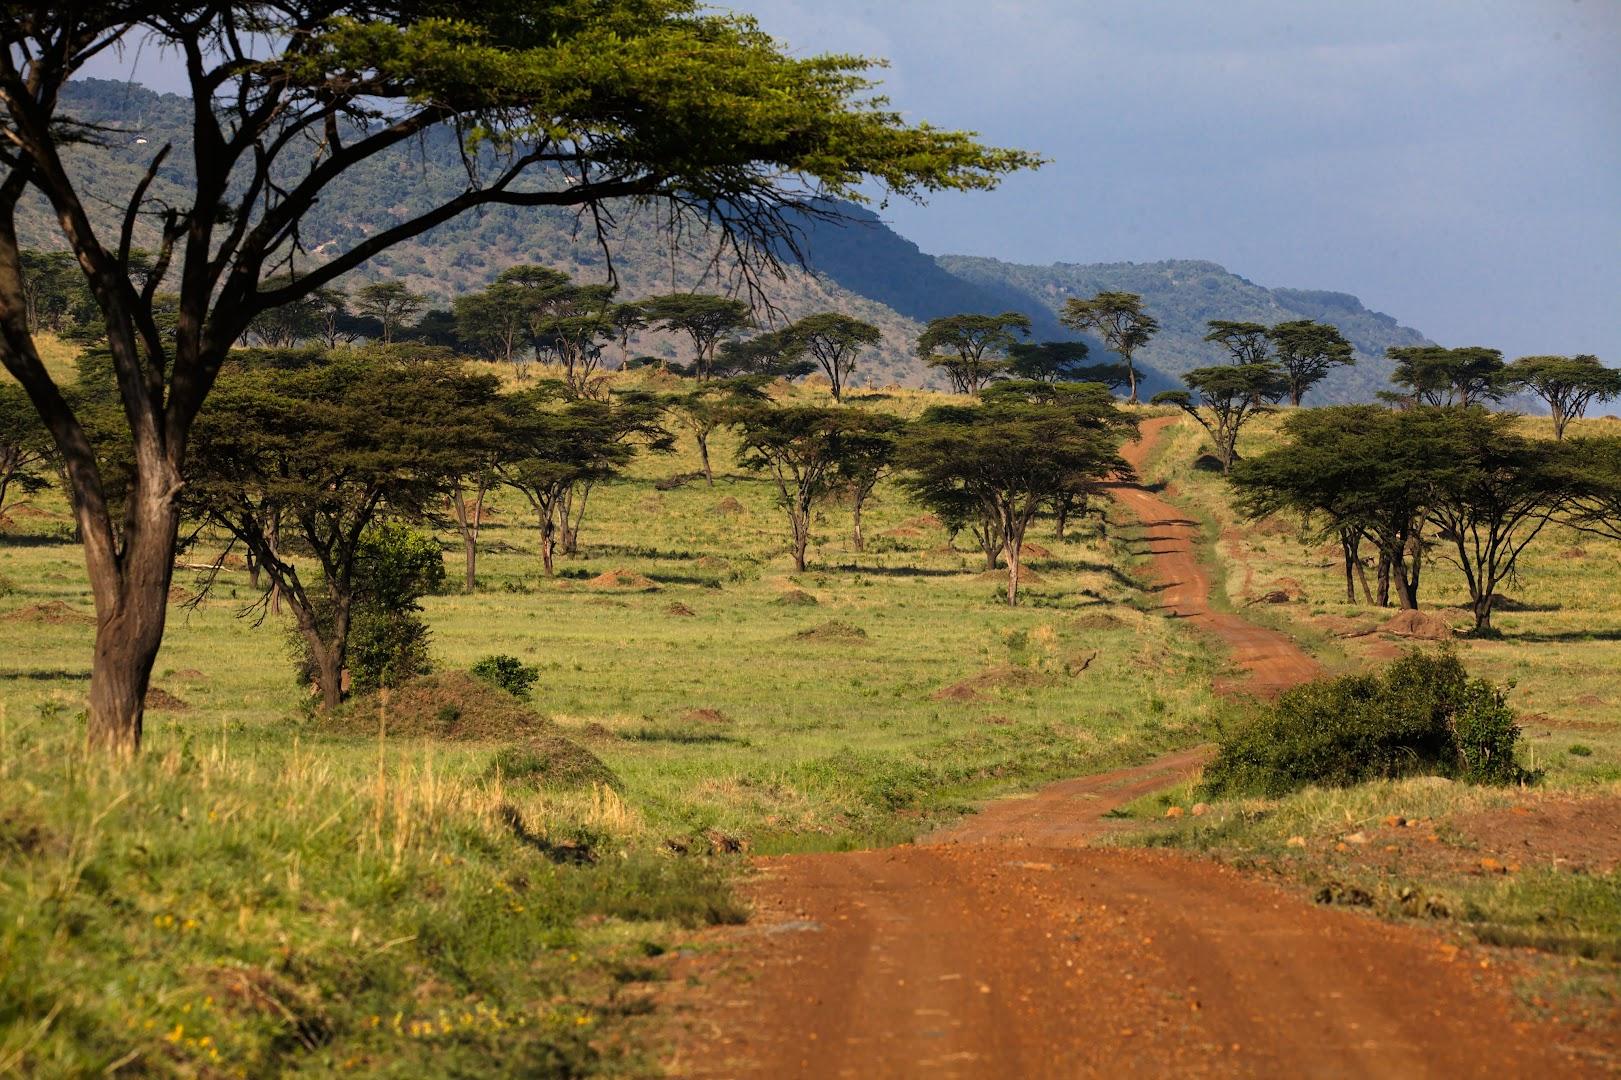 Masai Mara is beautiful after rains